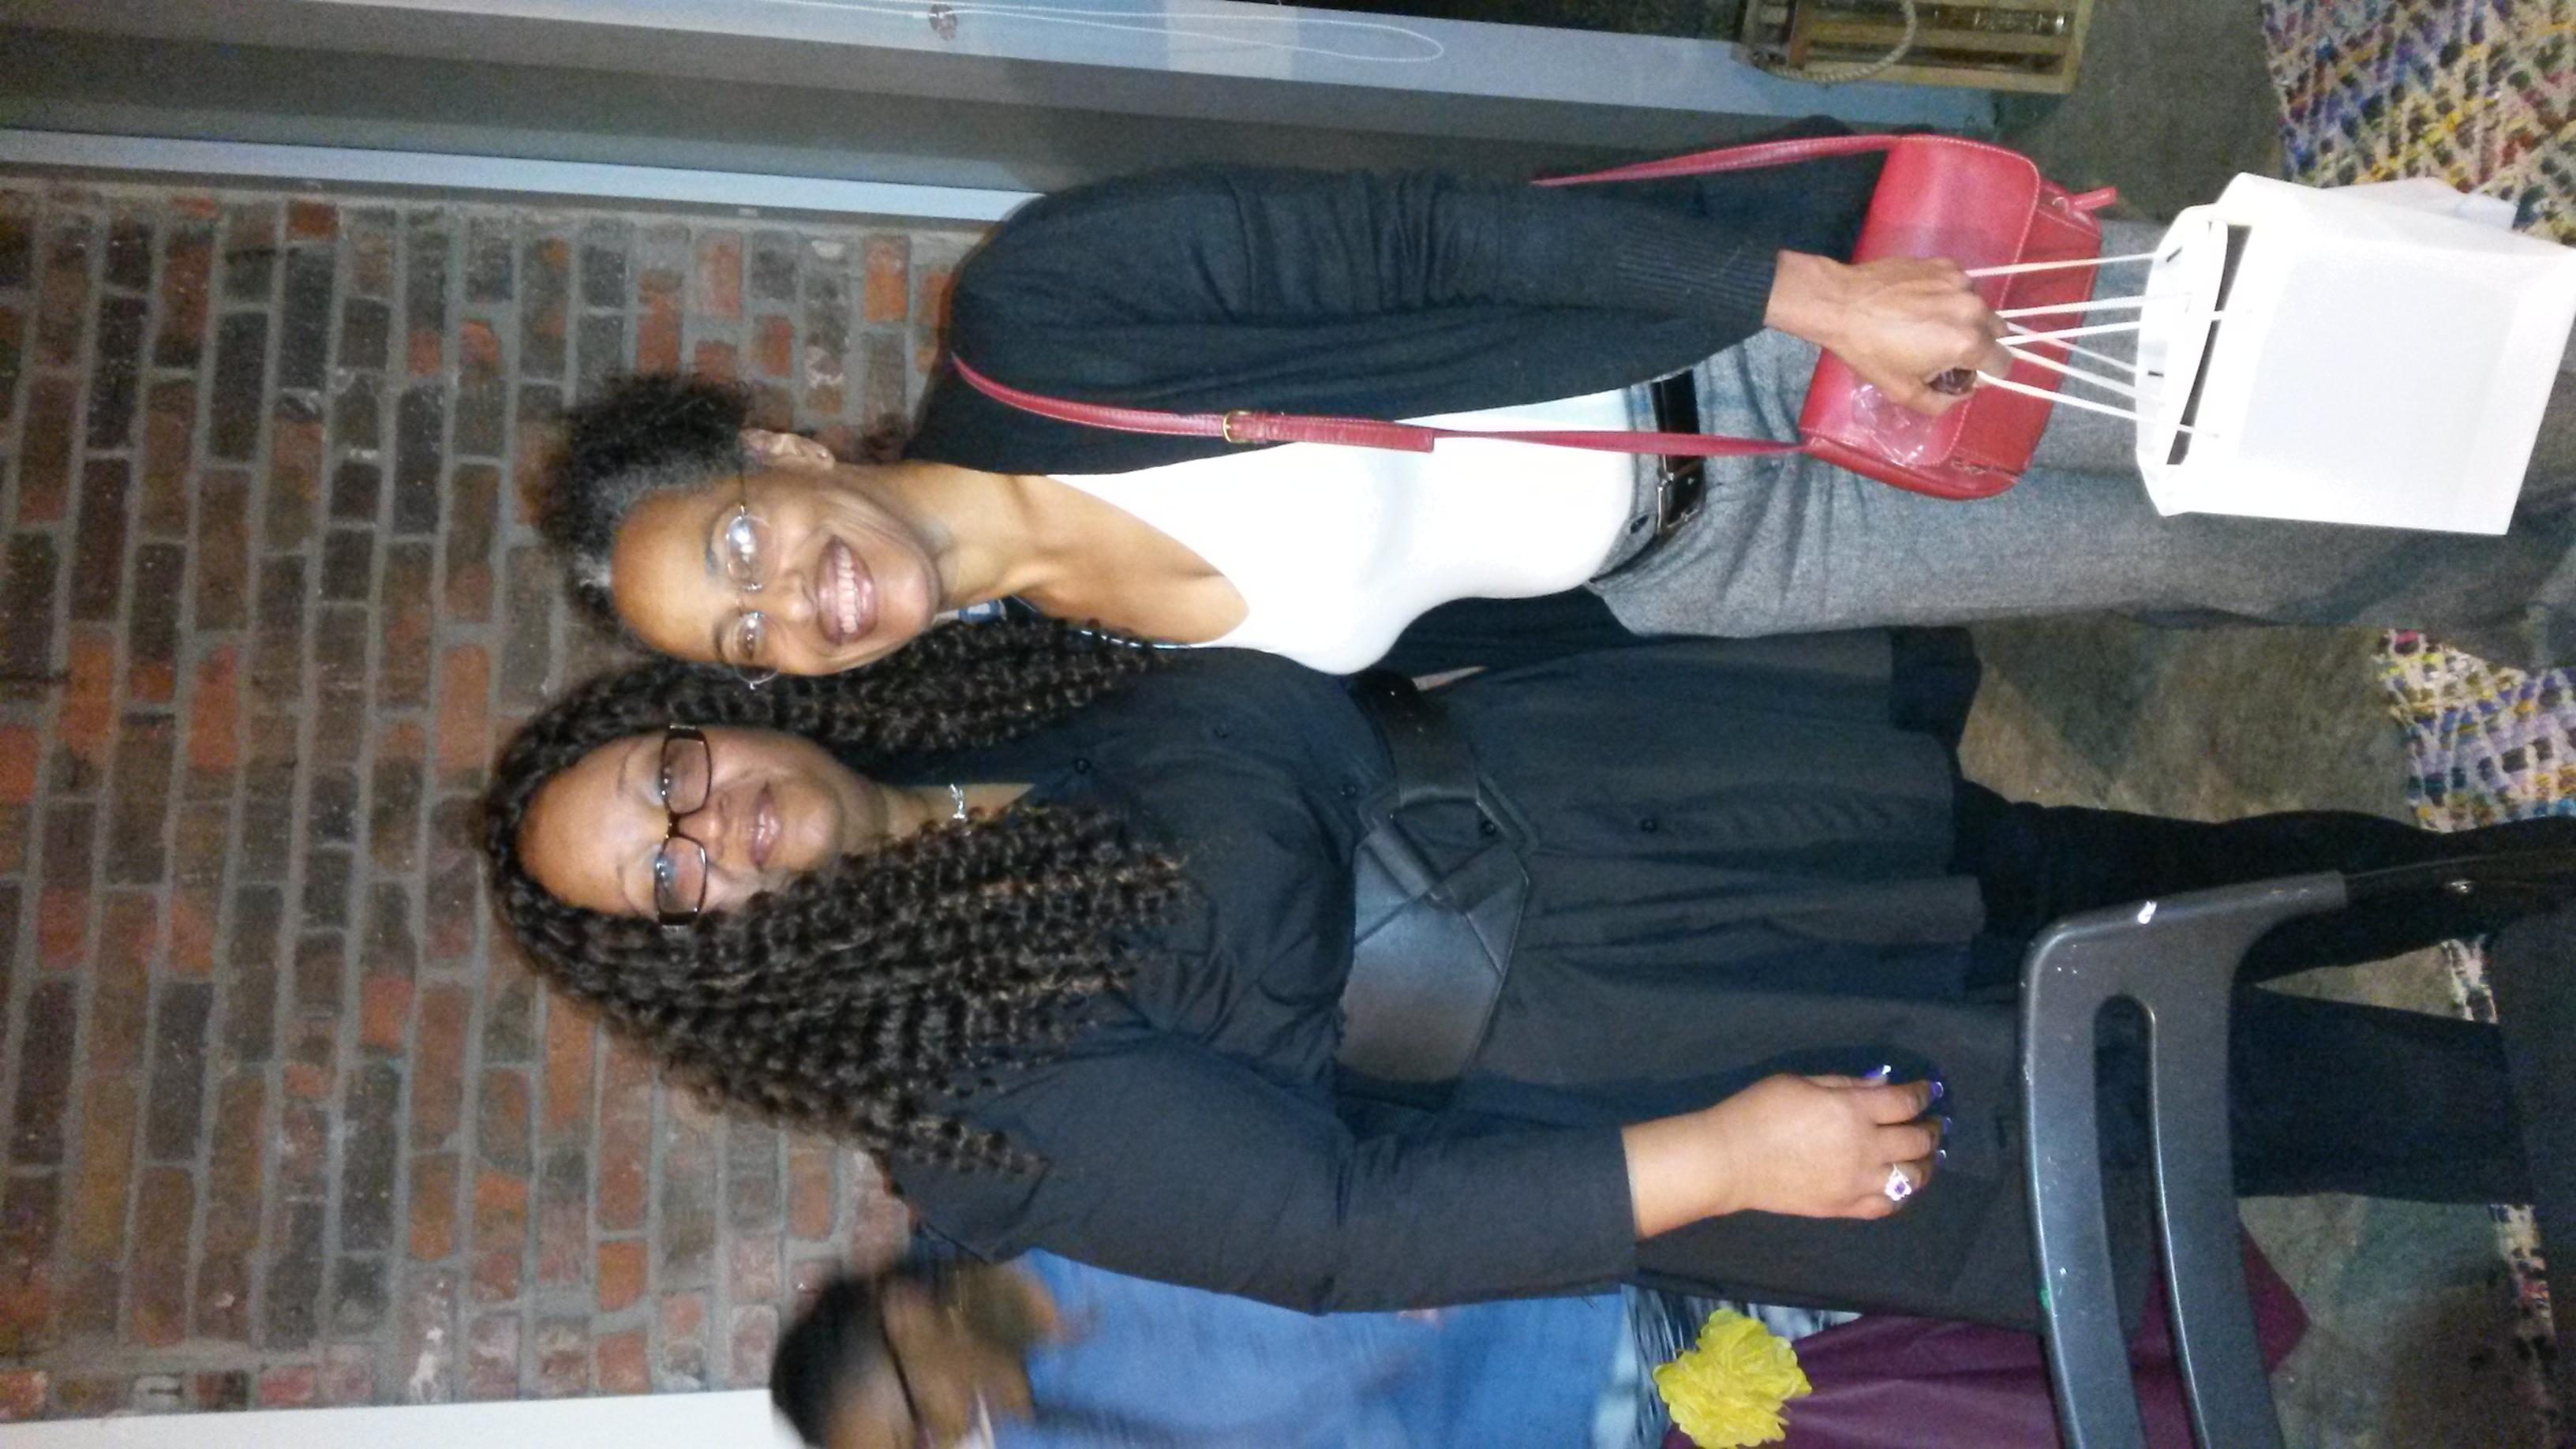 Nita Nae & Latonya